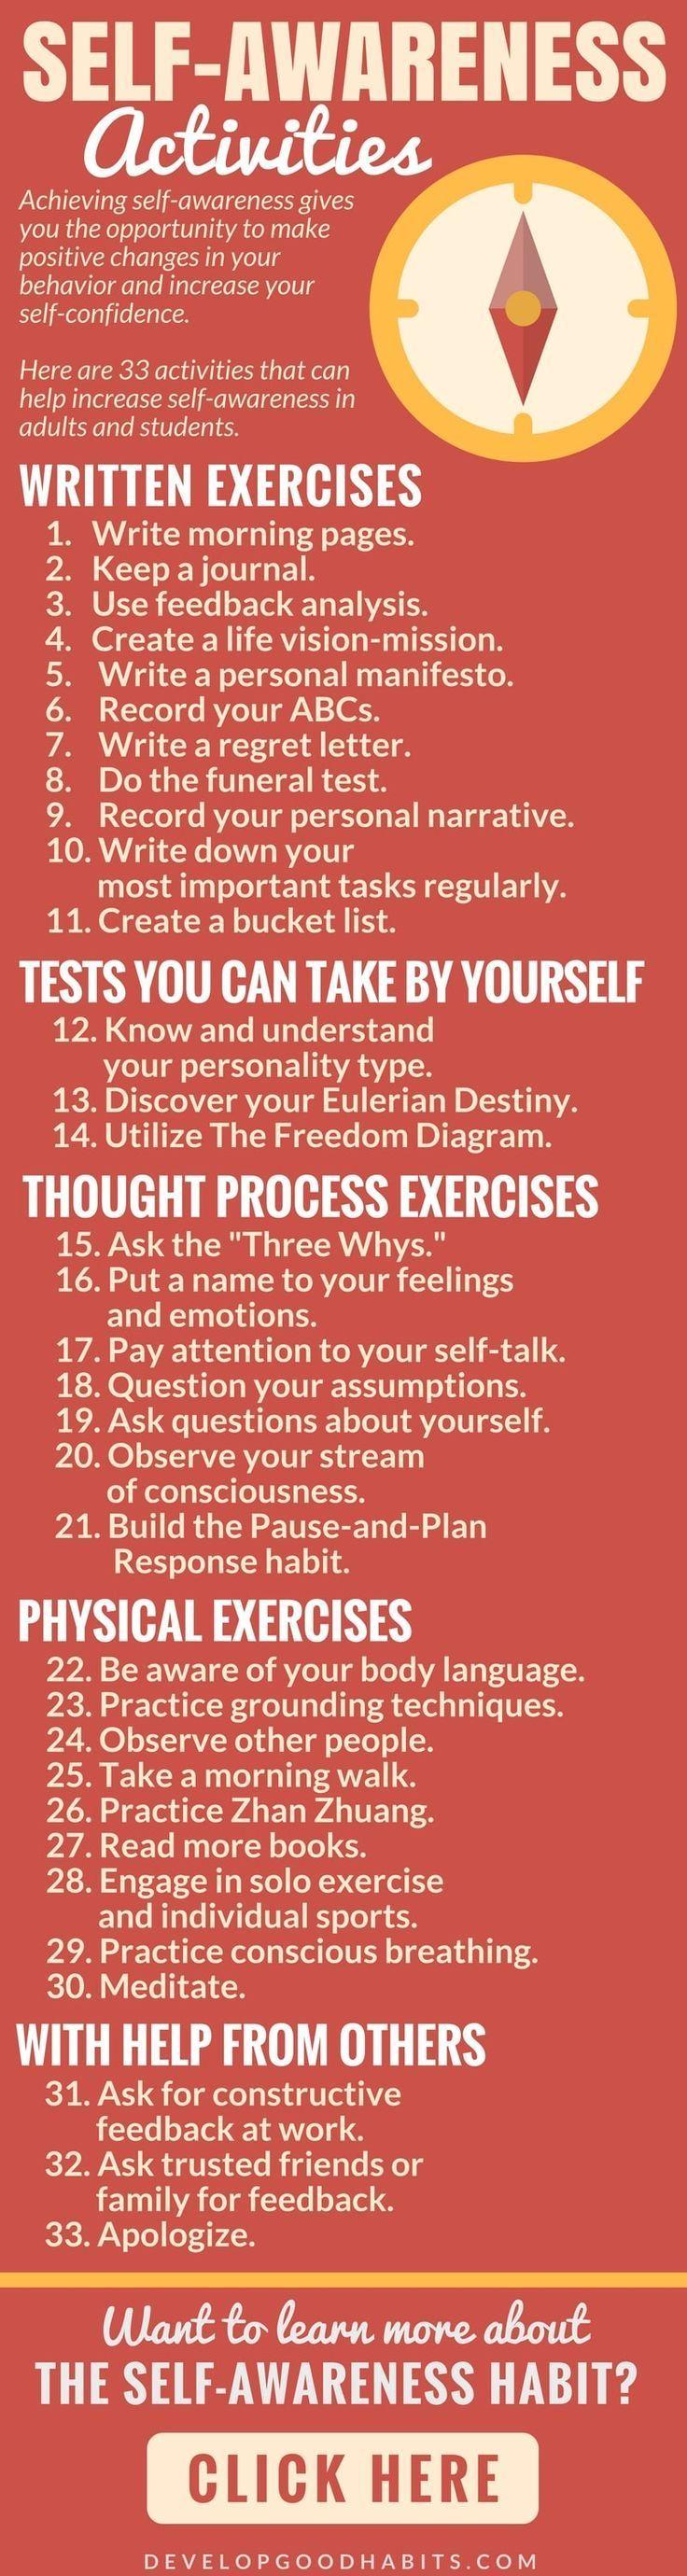 99 best wellness images on pinterest healthy living alternative